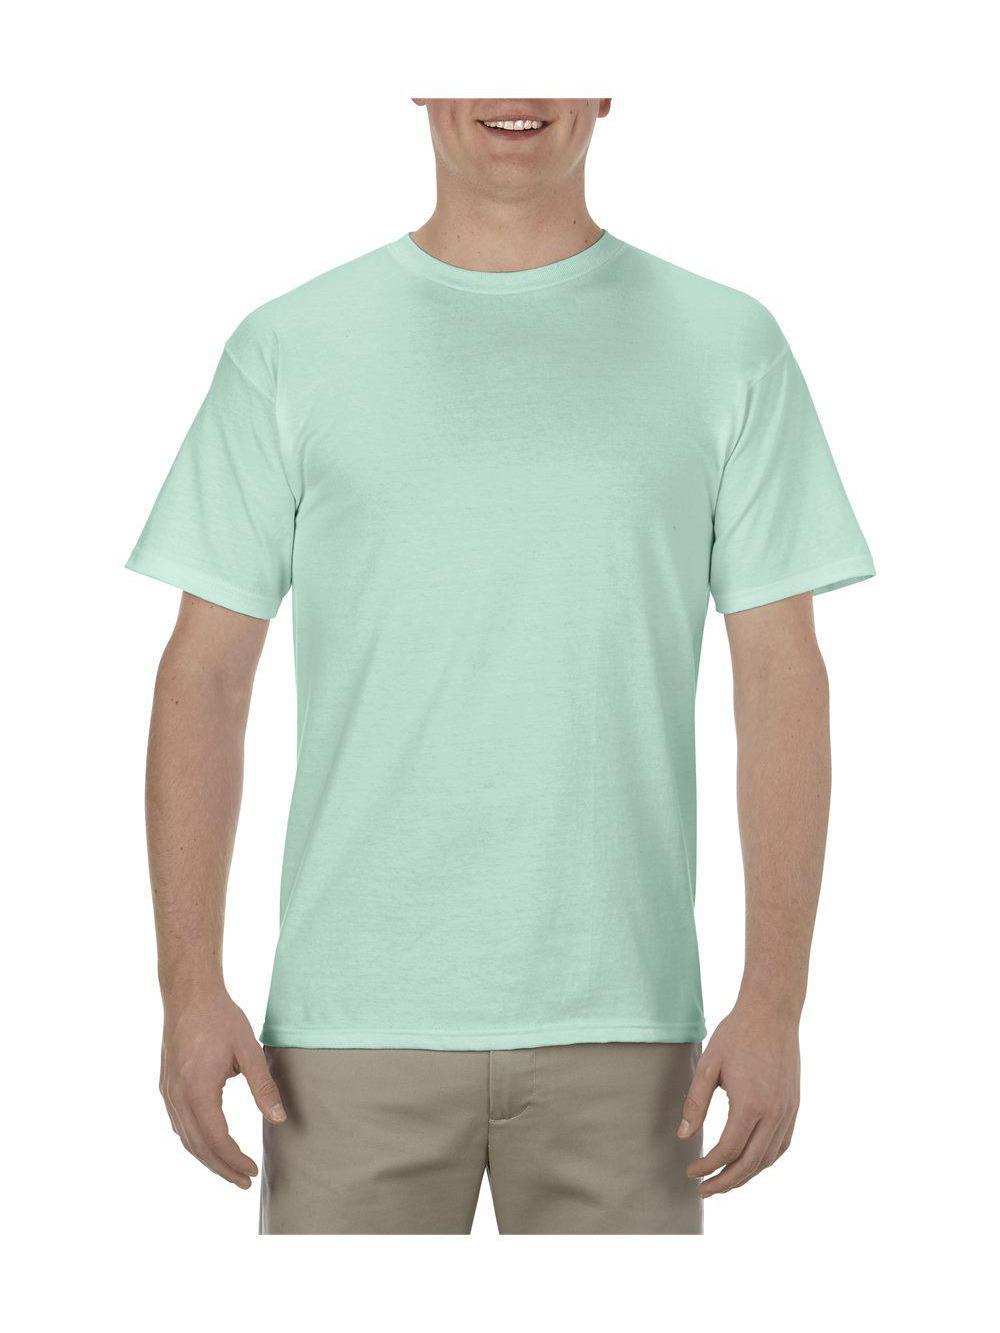 ALSTYLE-Premium-T-Shirt-1701 thumbnail 21